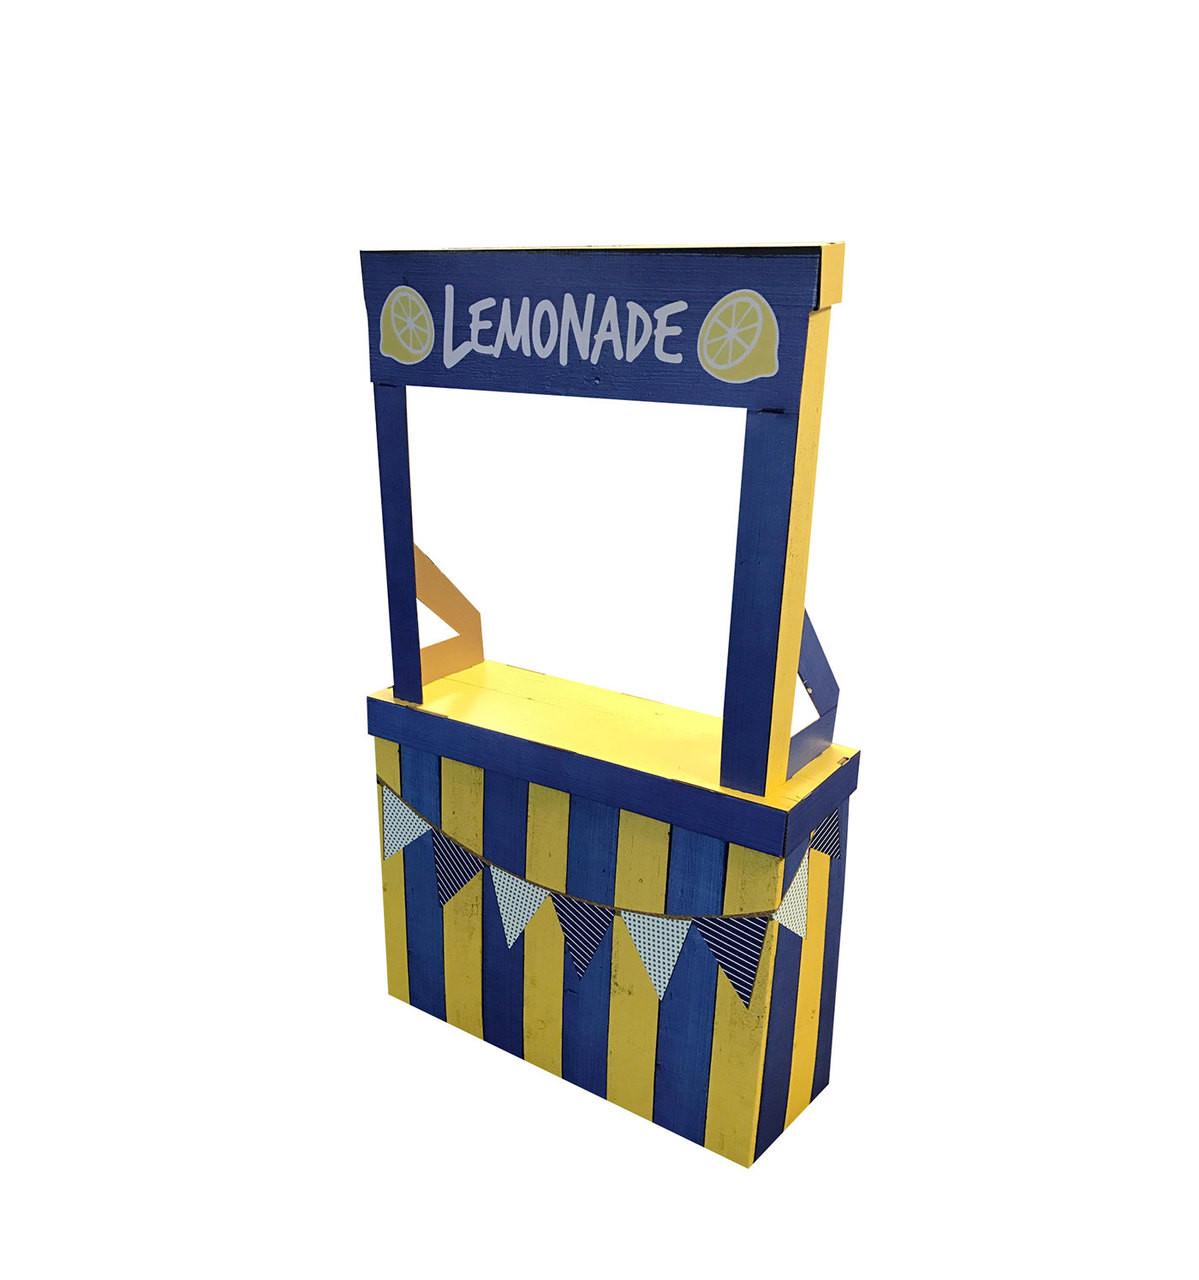 Life-size Lemonade Stand Cardboard Standup  |Cardboard Cutout